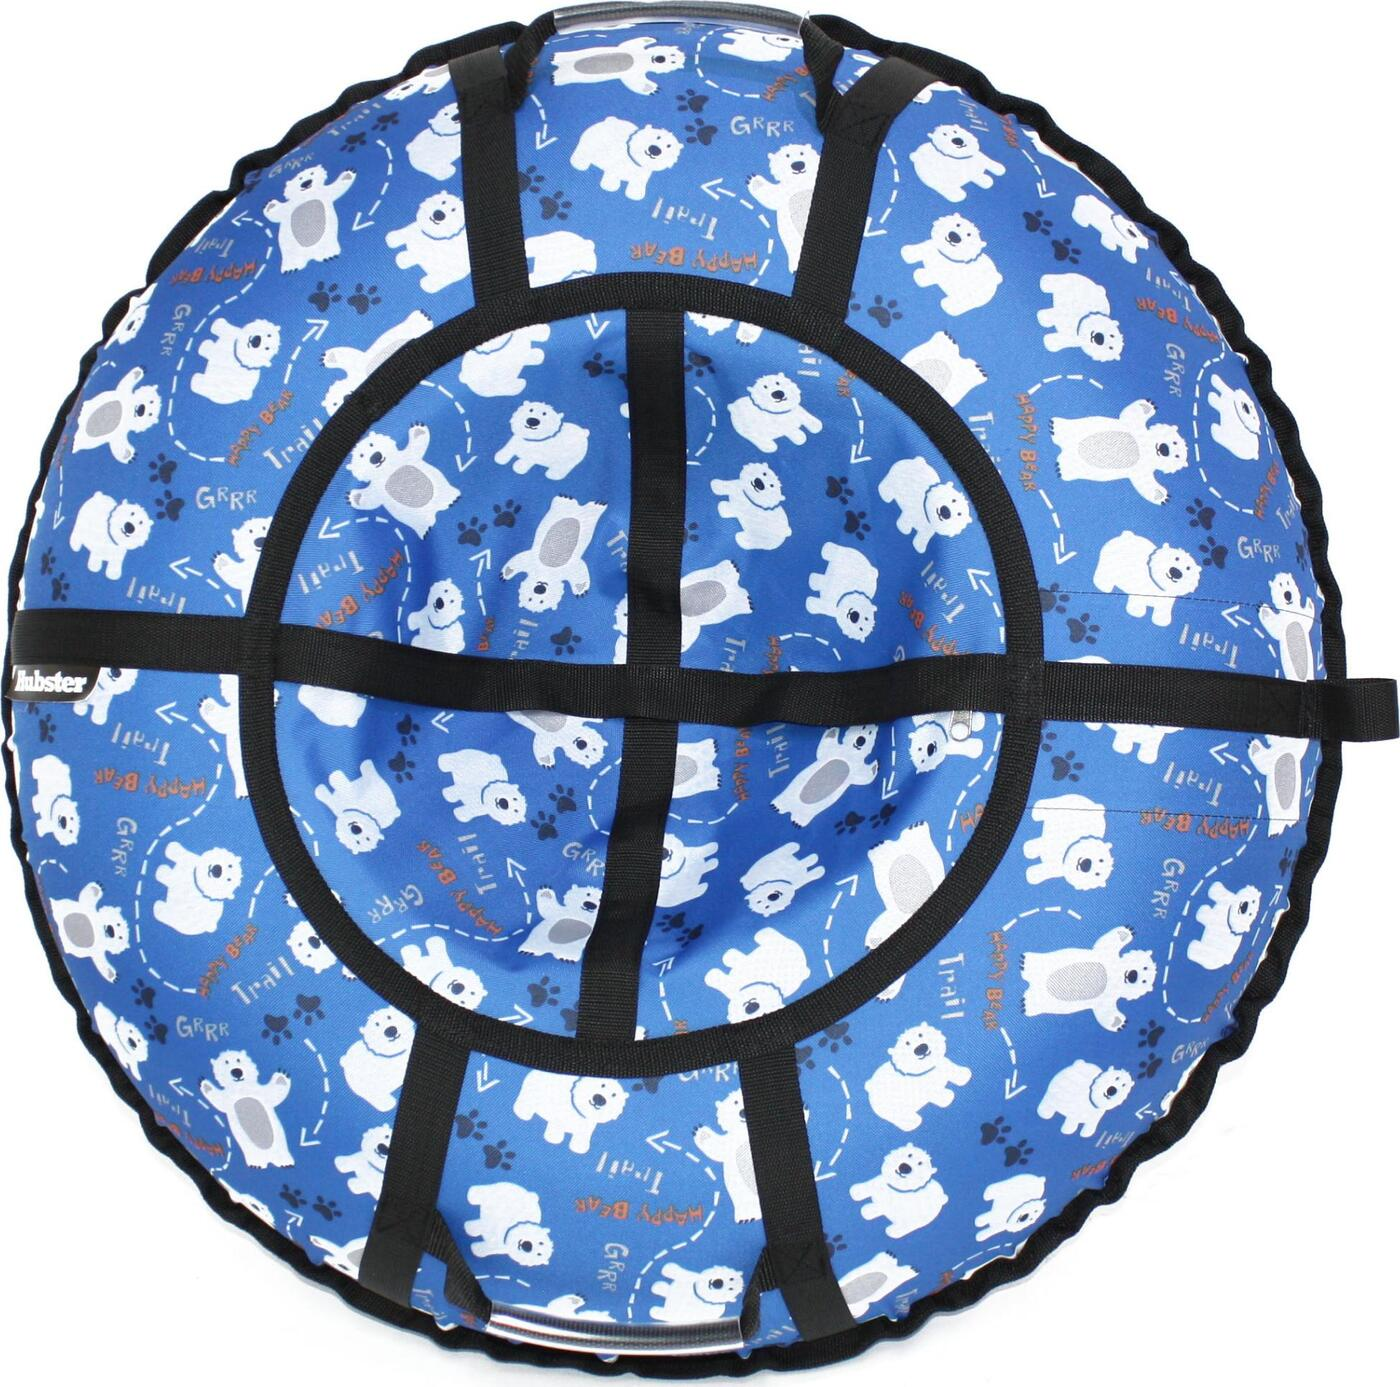 Тюбинг Hubster Люкс Pro Мишки синие (120см) тюбинг hubster люкс pro мишки 120cm violet во5132 3